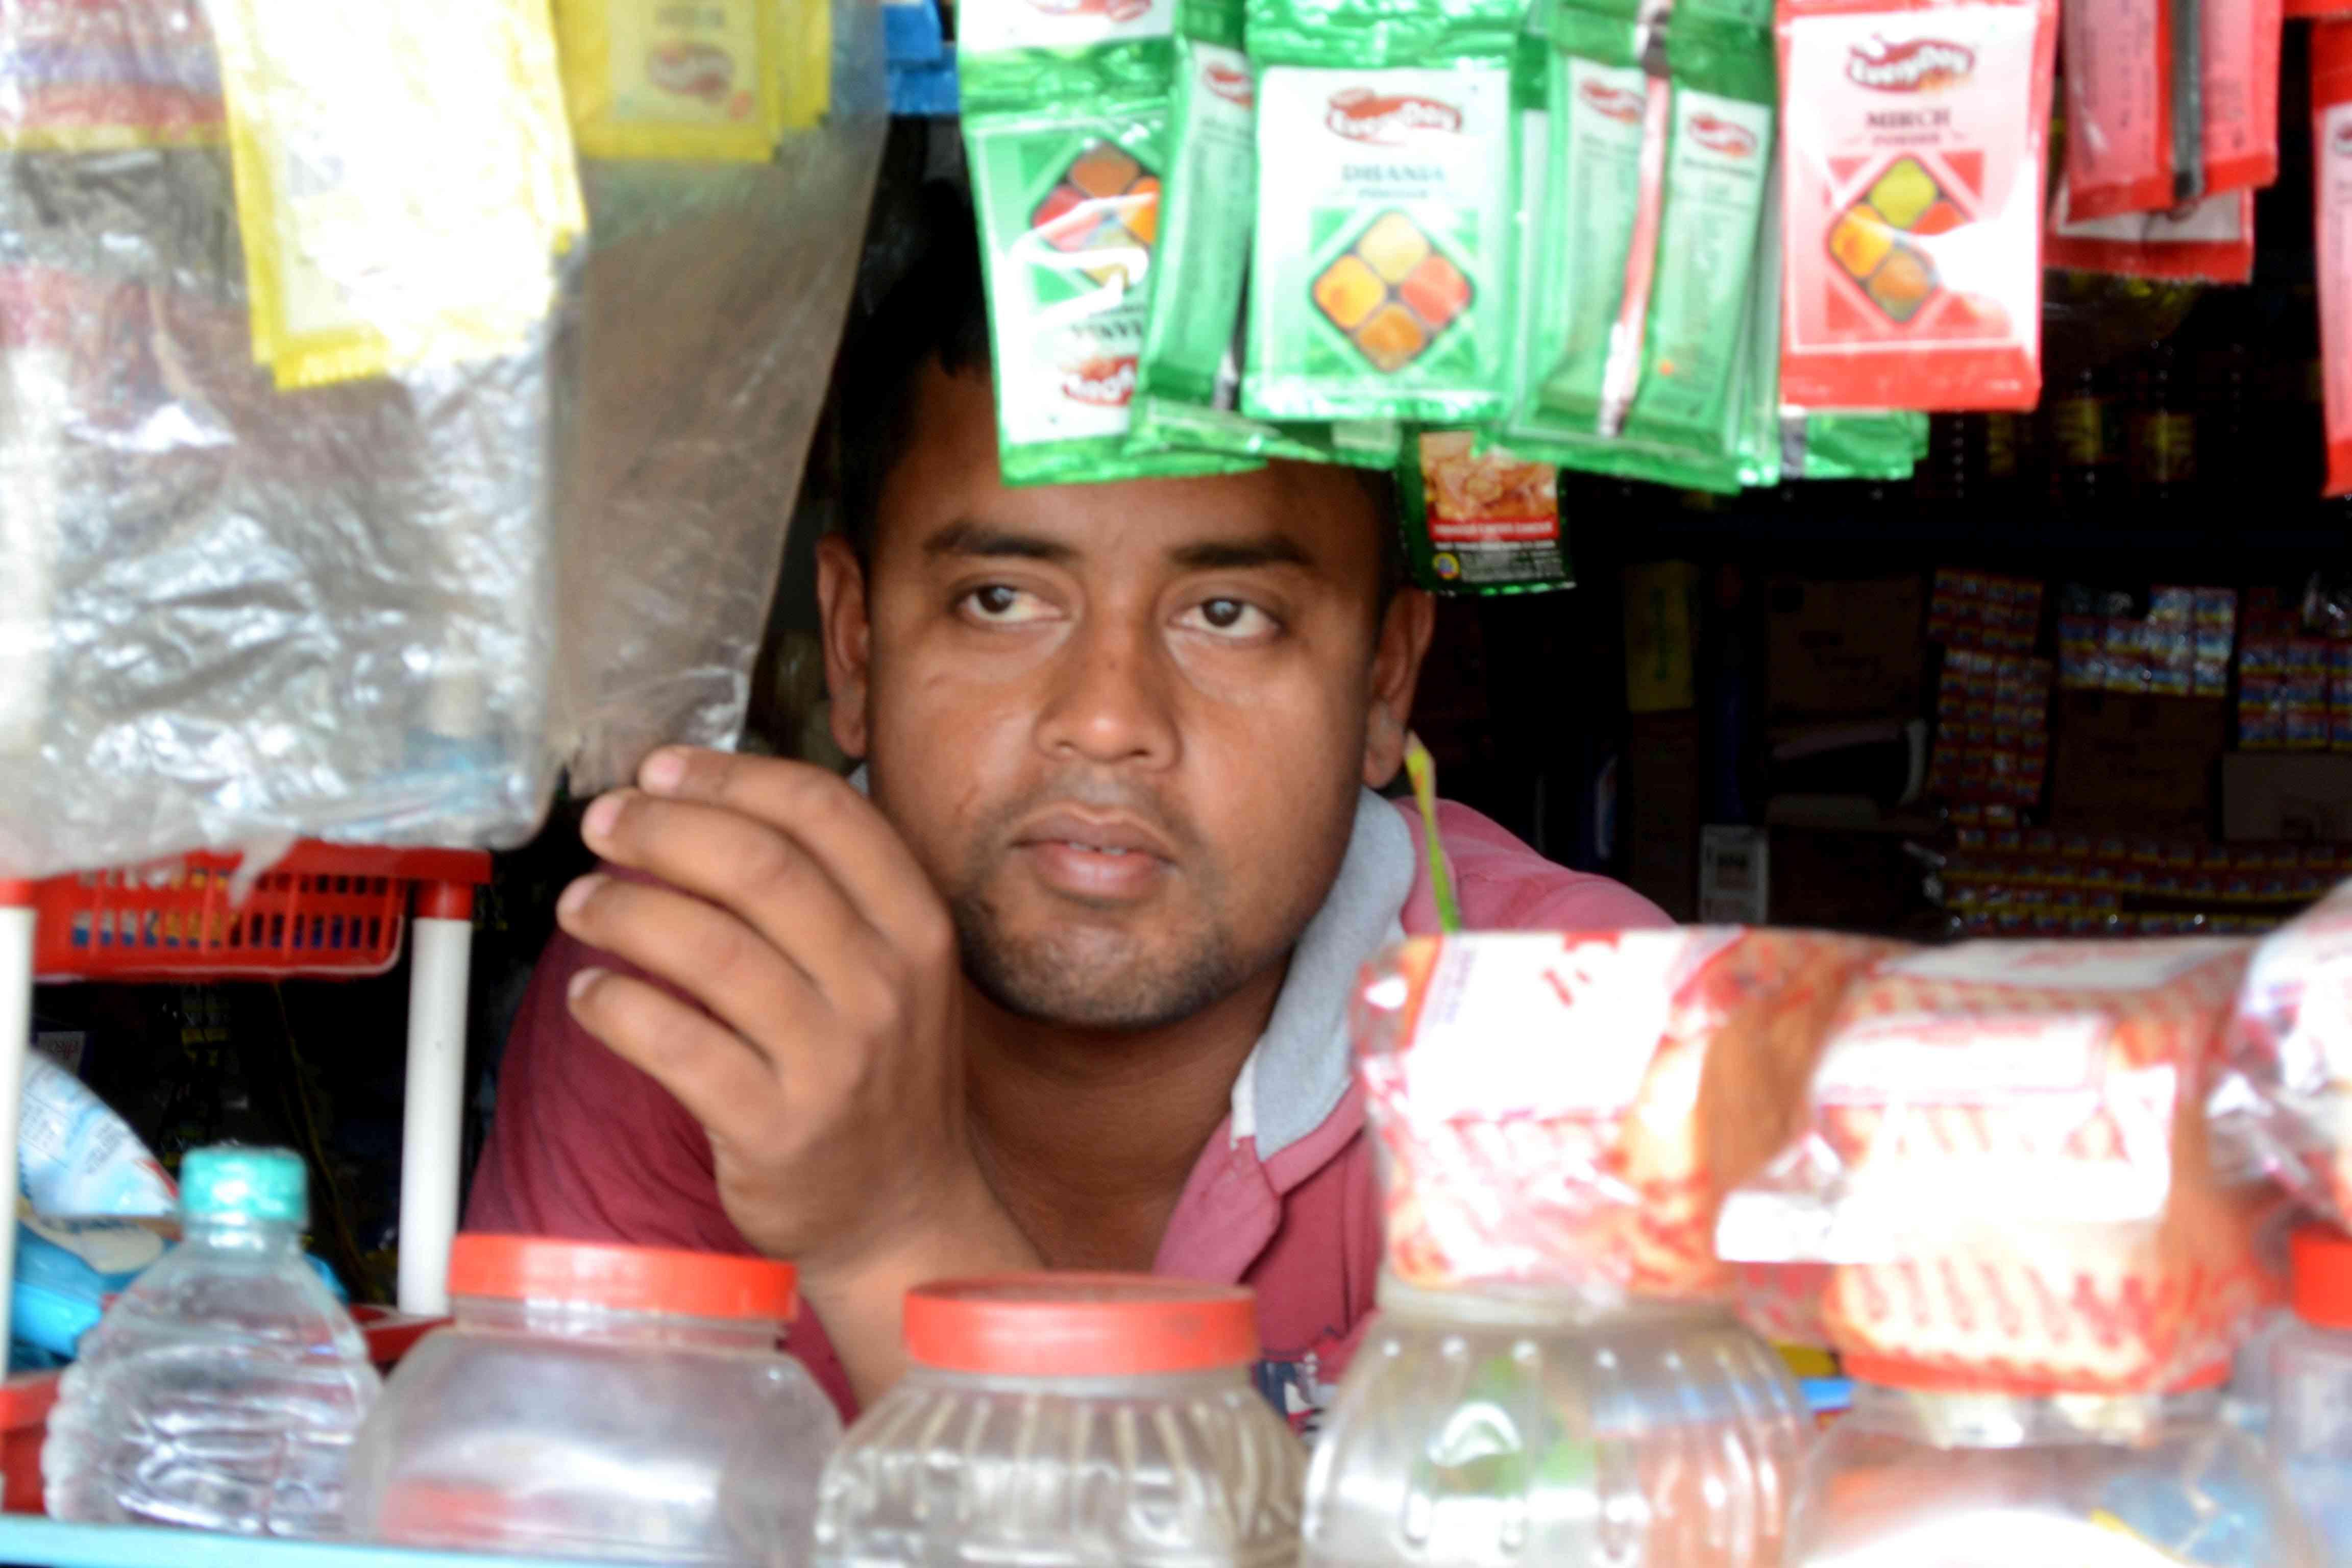 Moina Dutta runs a grocery shop in Lakhimpur. Photo credit: Anupam Chakravartty